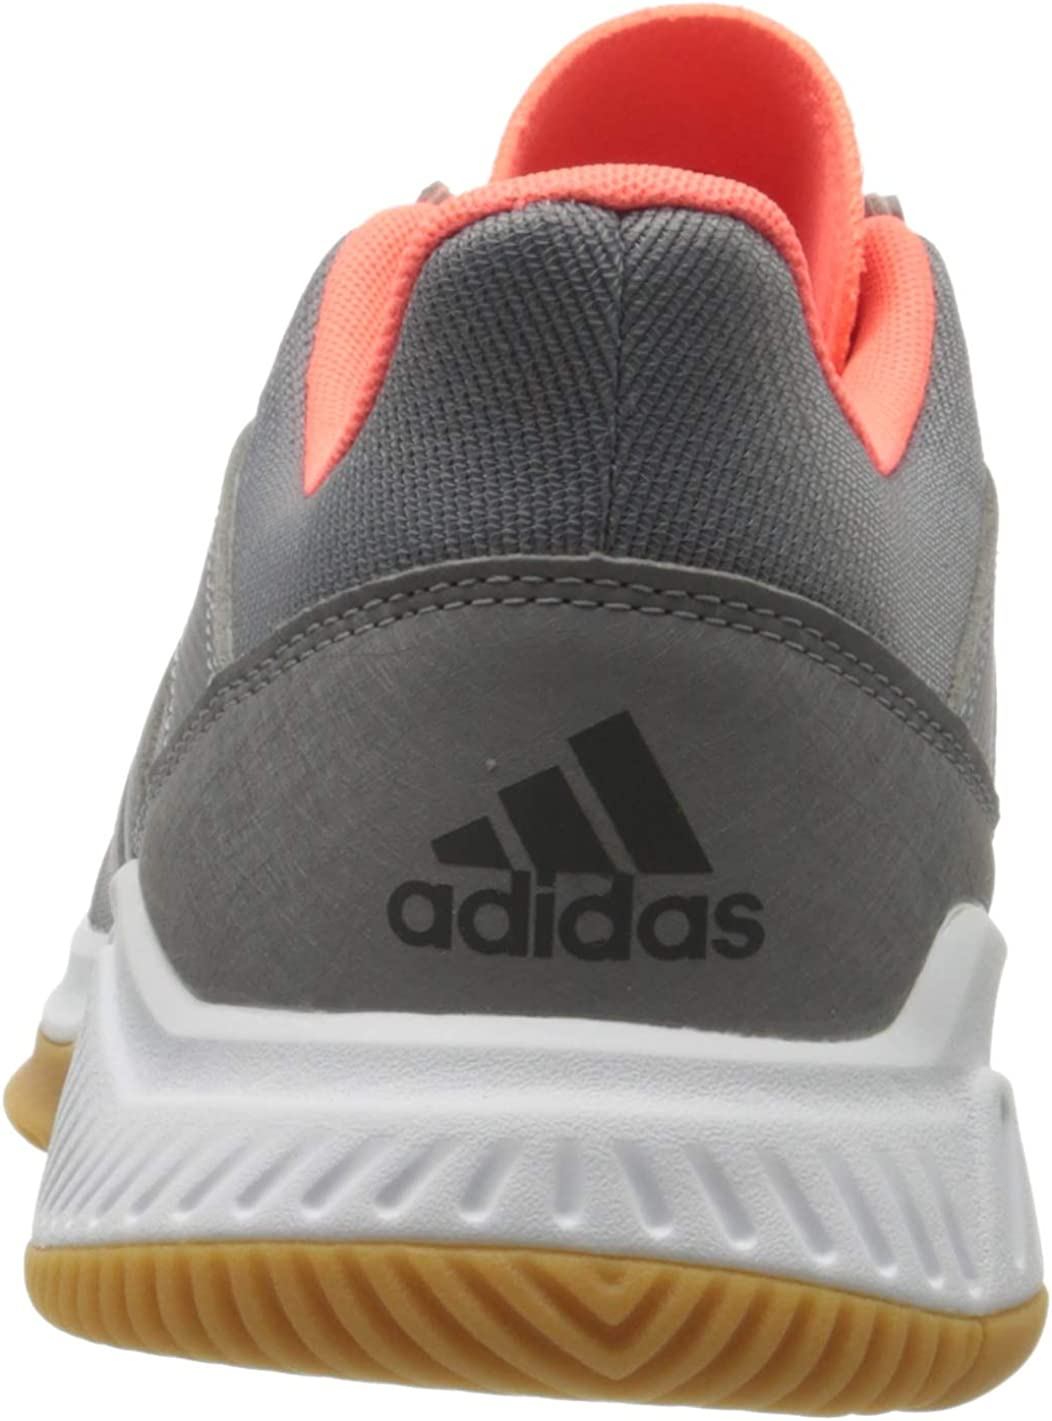 adidas Men's Handball Shoes